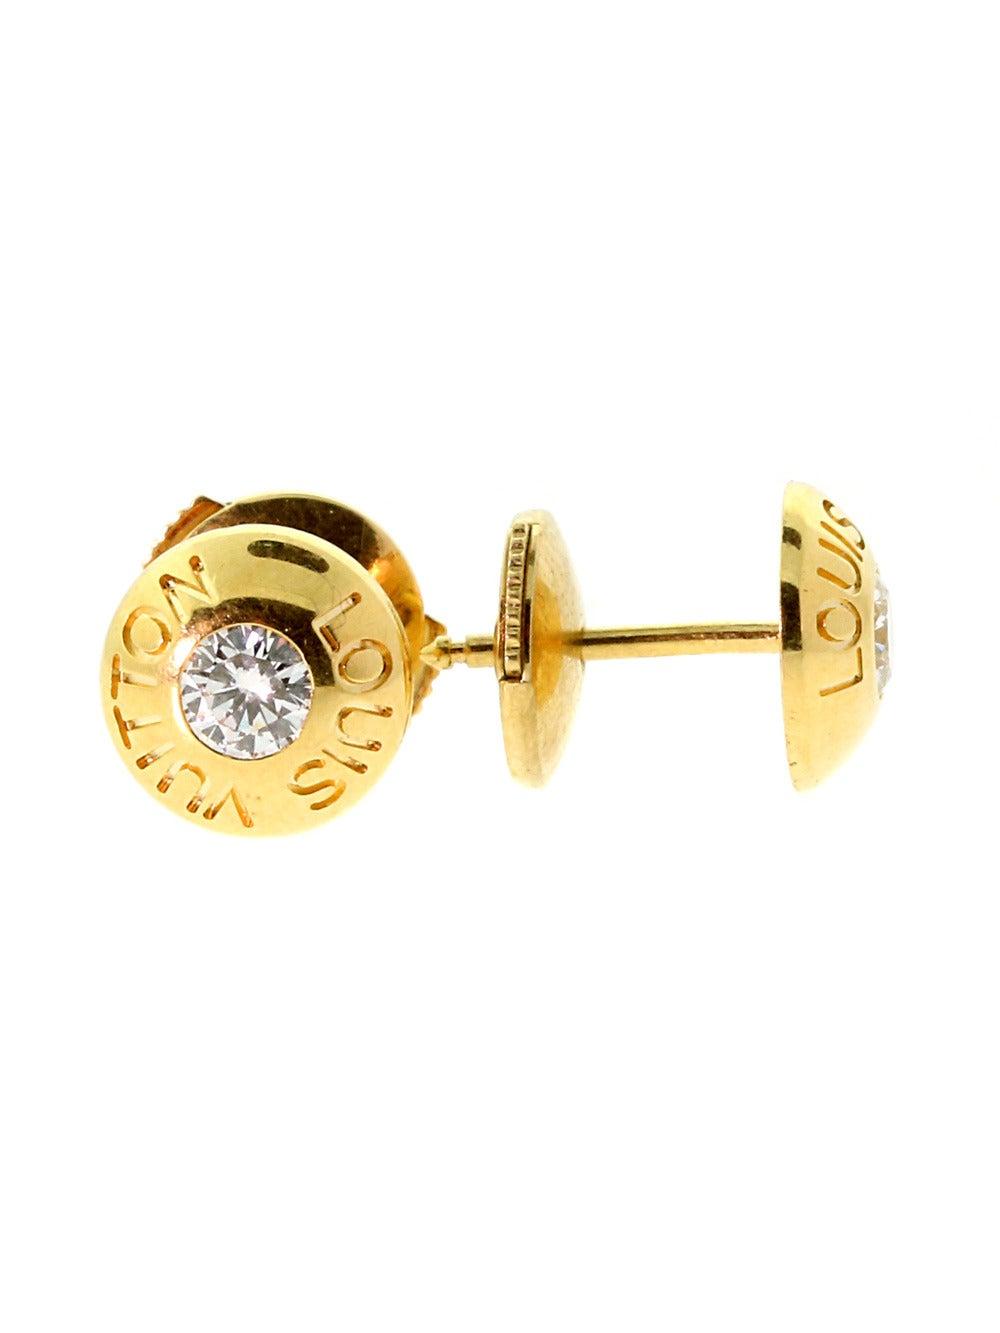 Louis Vuitton Diamond Gold Stud Earrings 2